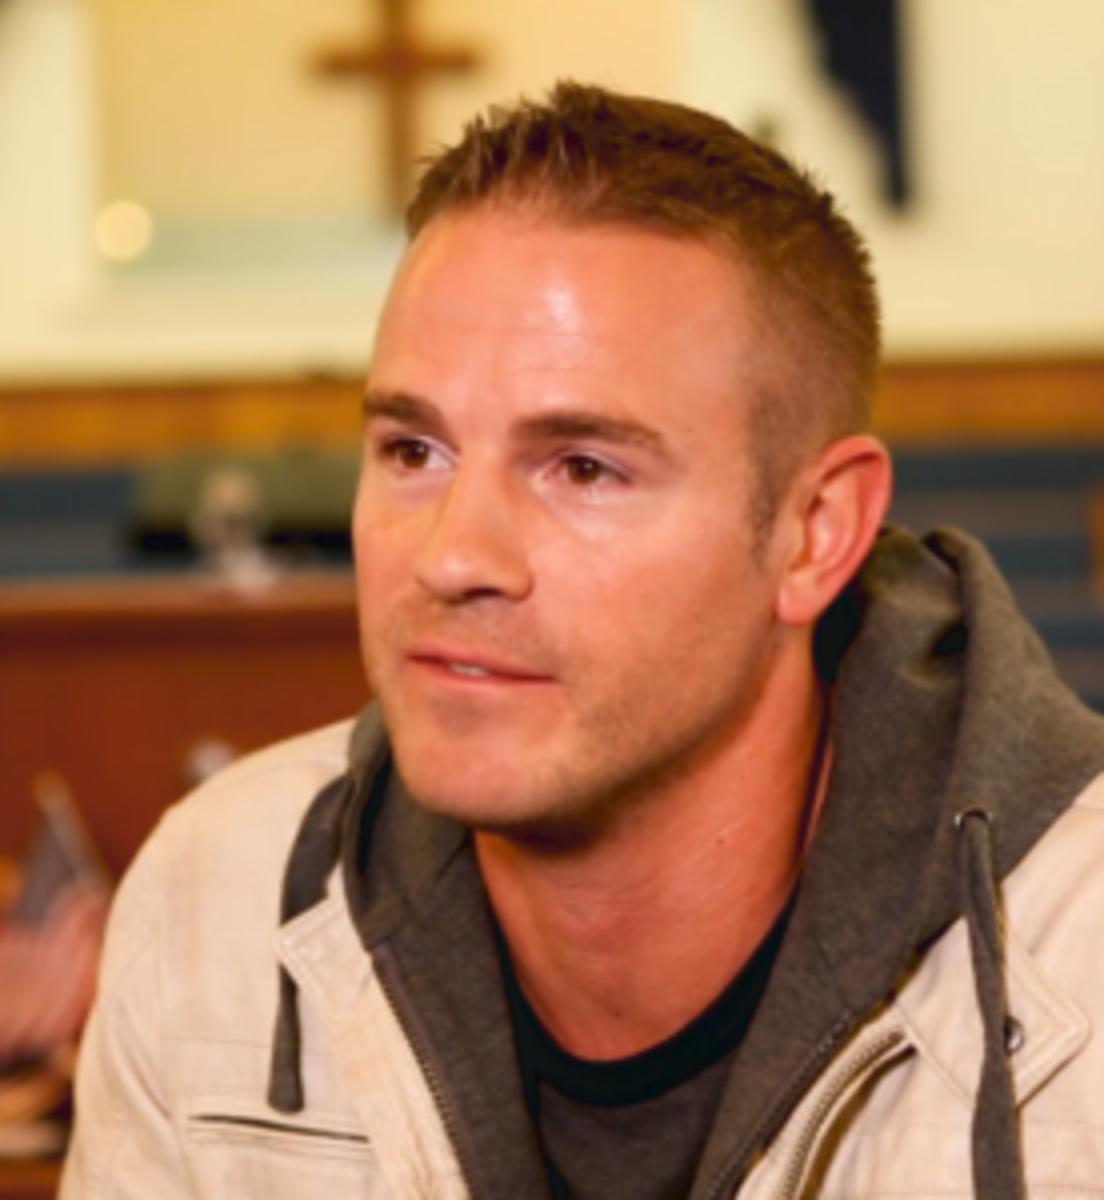 Screenwriter Jake McEntire